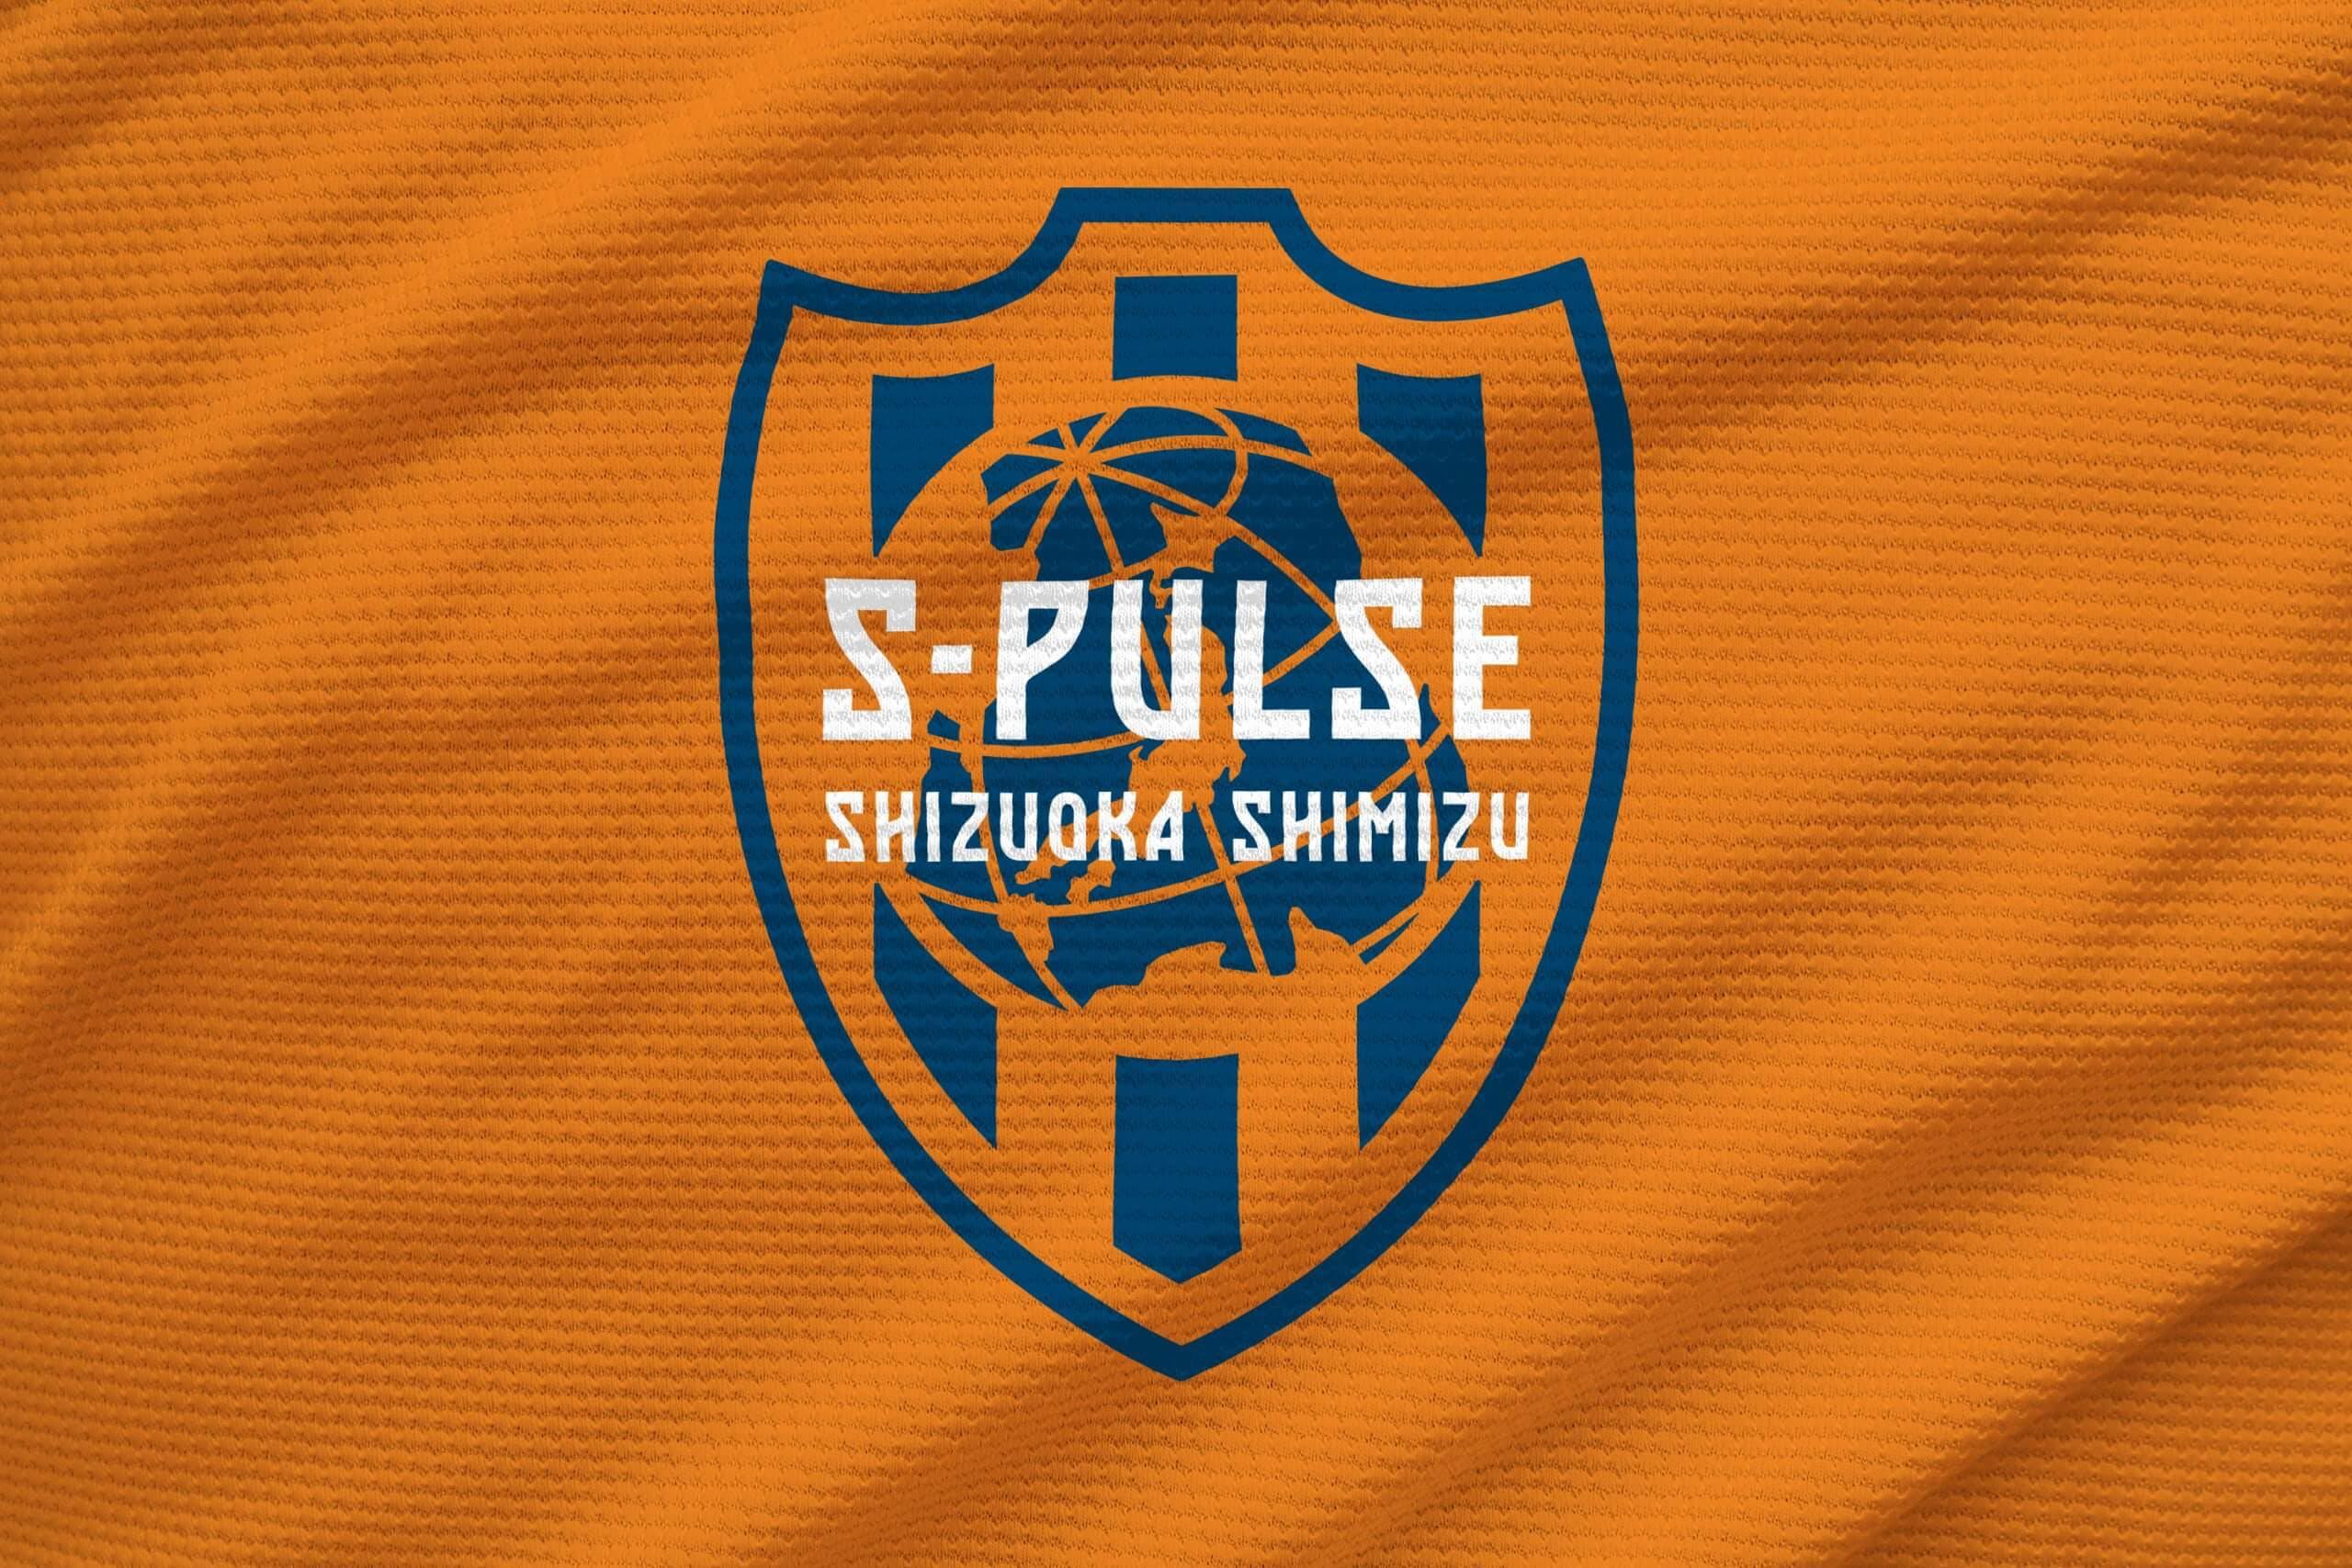 SHIMIZU S-PULSE Brand Renewal